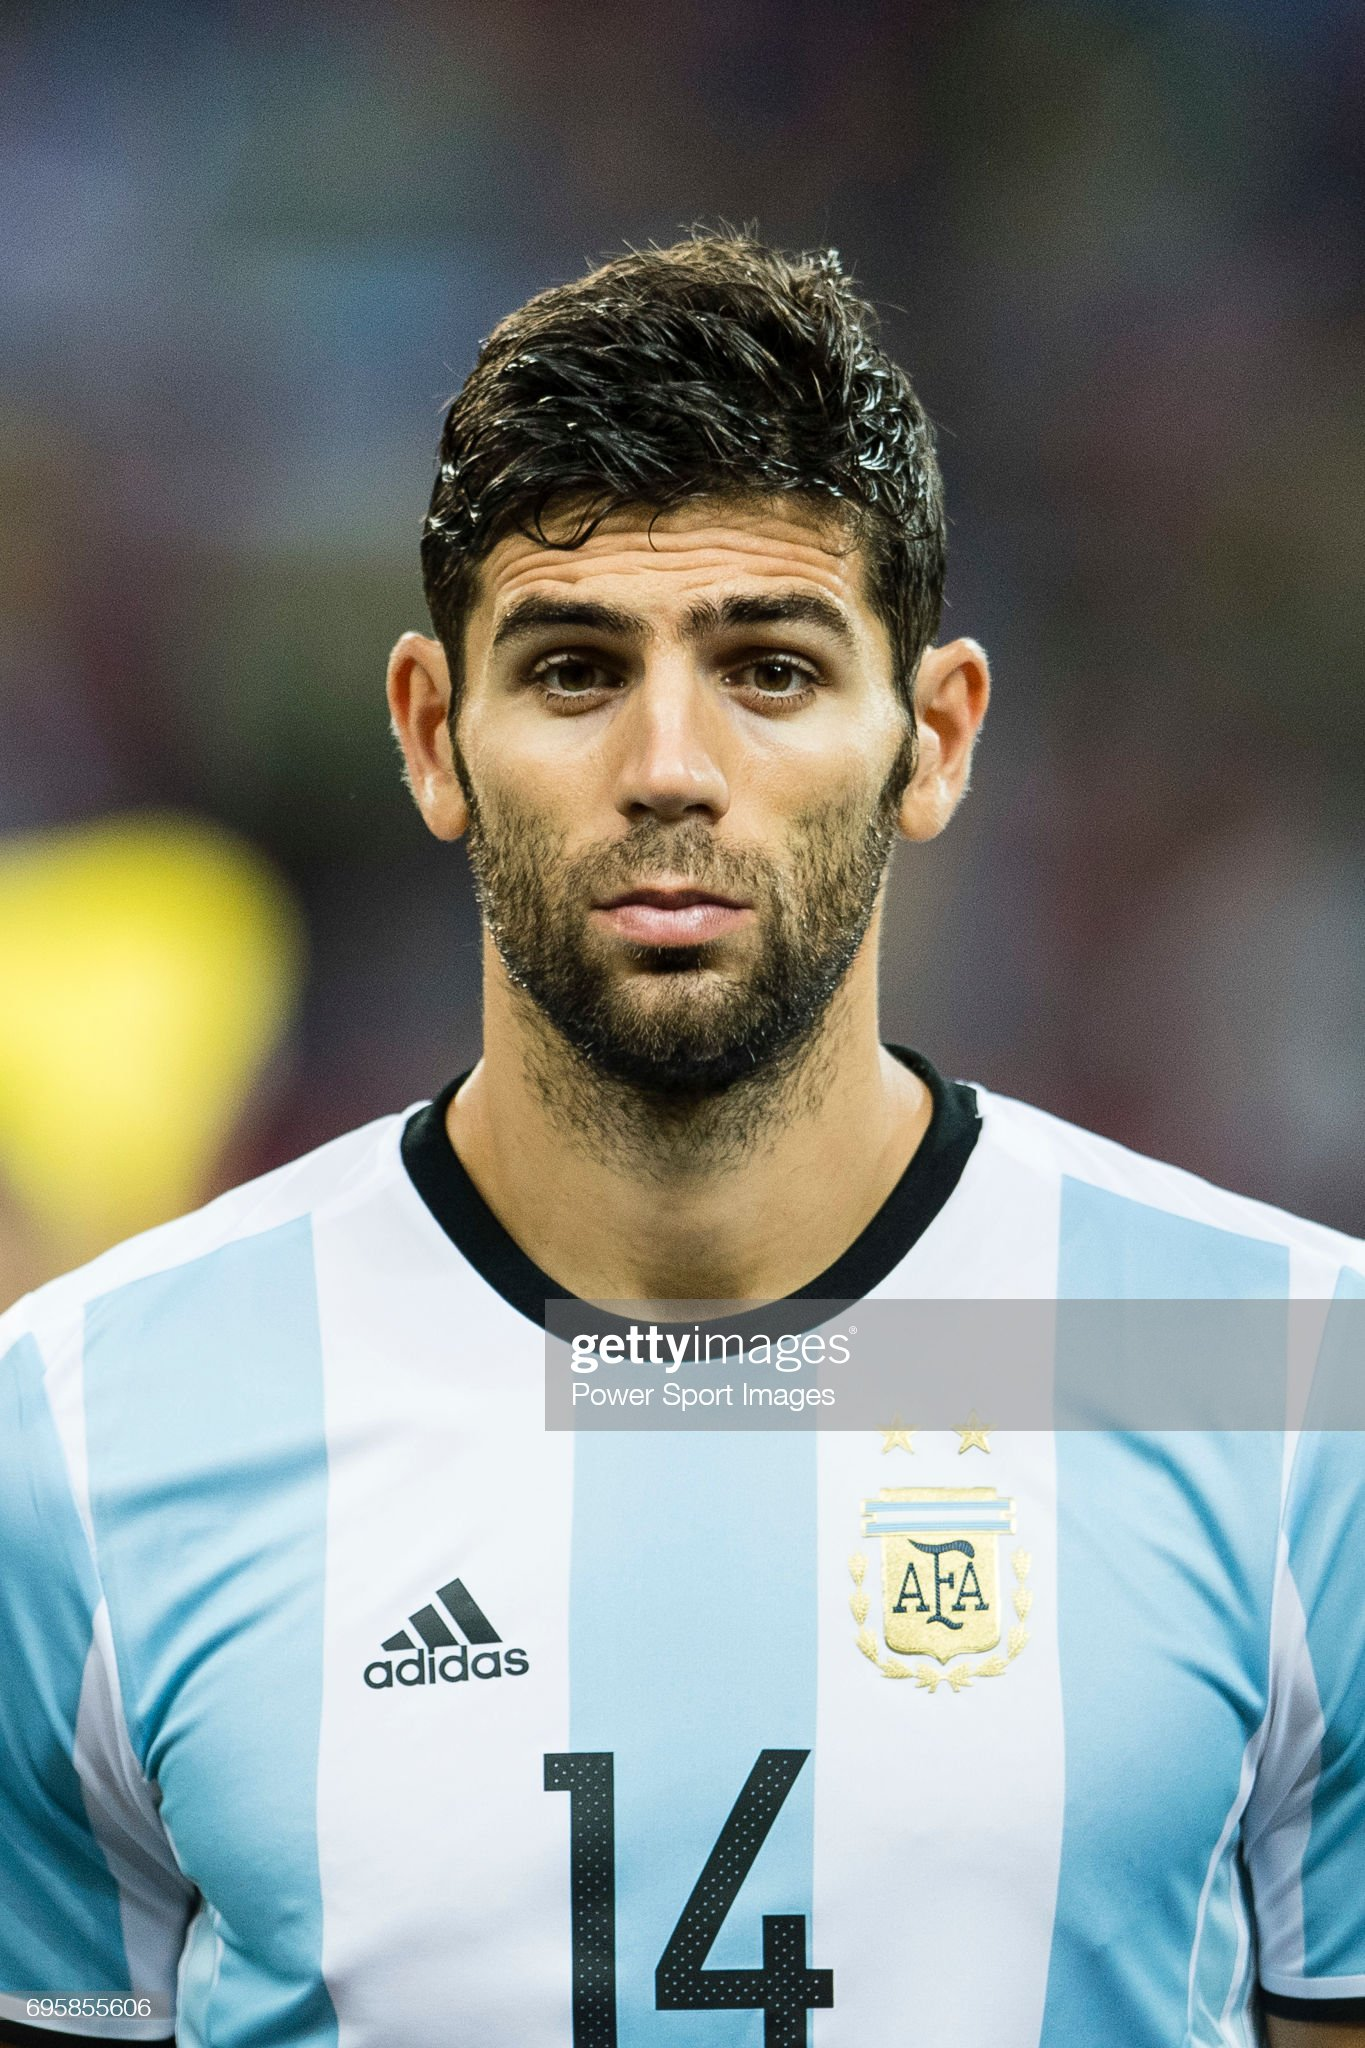 [Imagen: federico-fazio-of-argentina-during-the-i...=2048x2048]